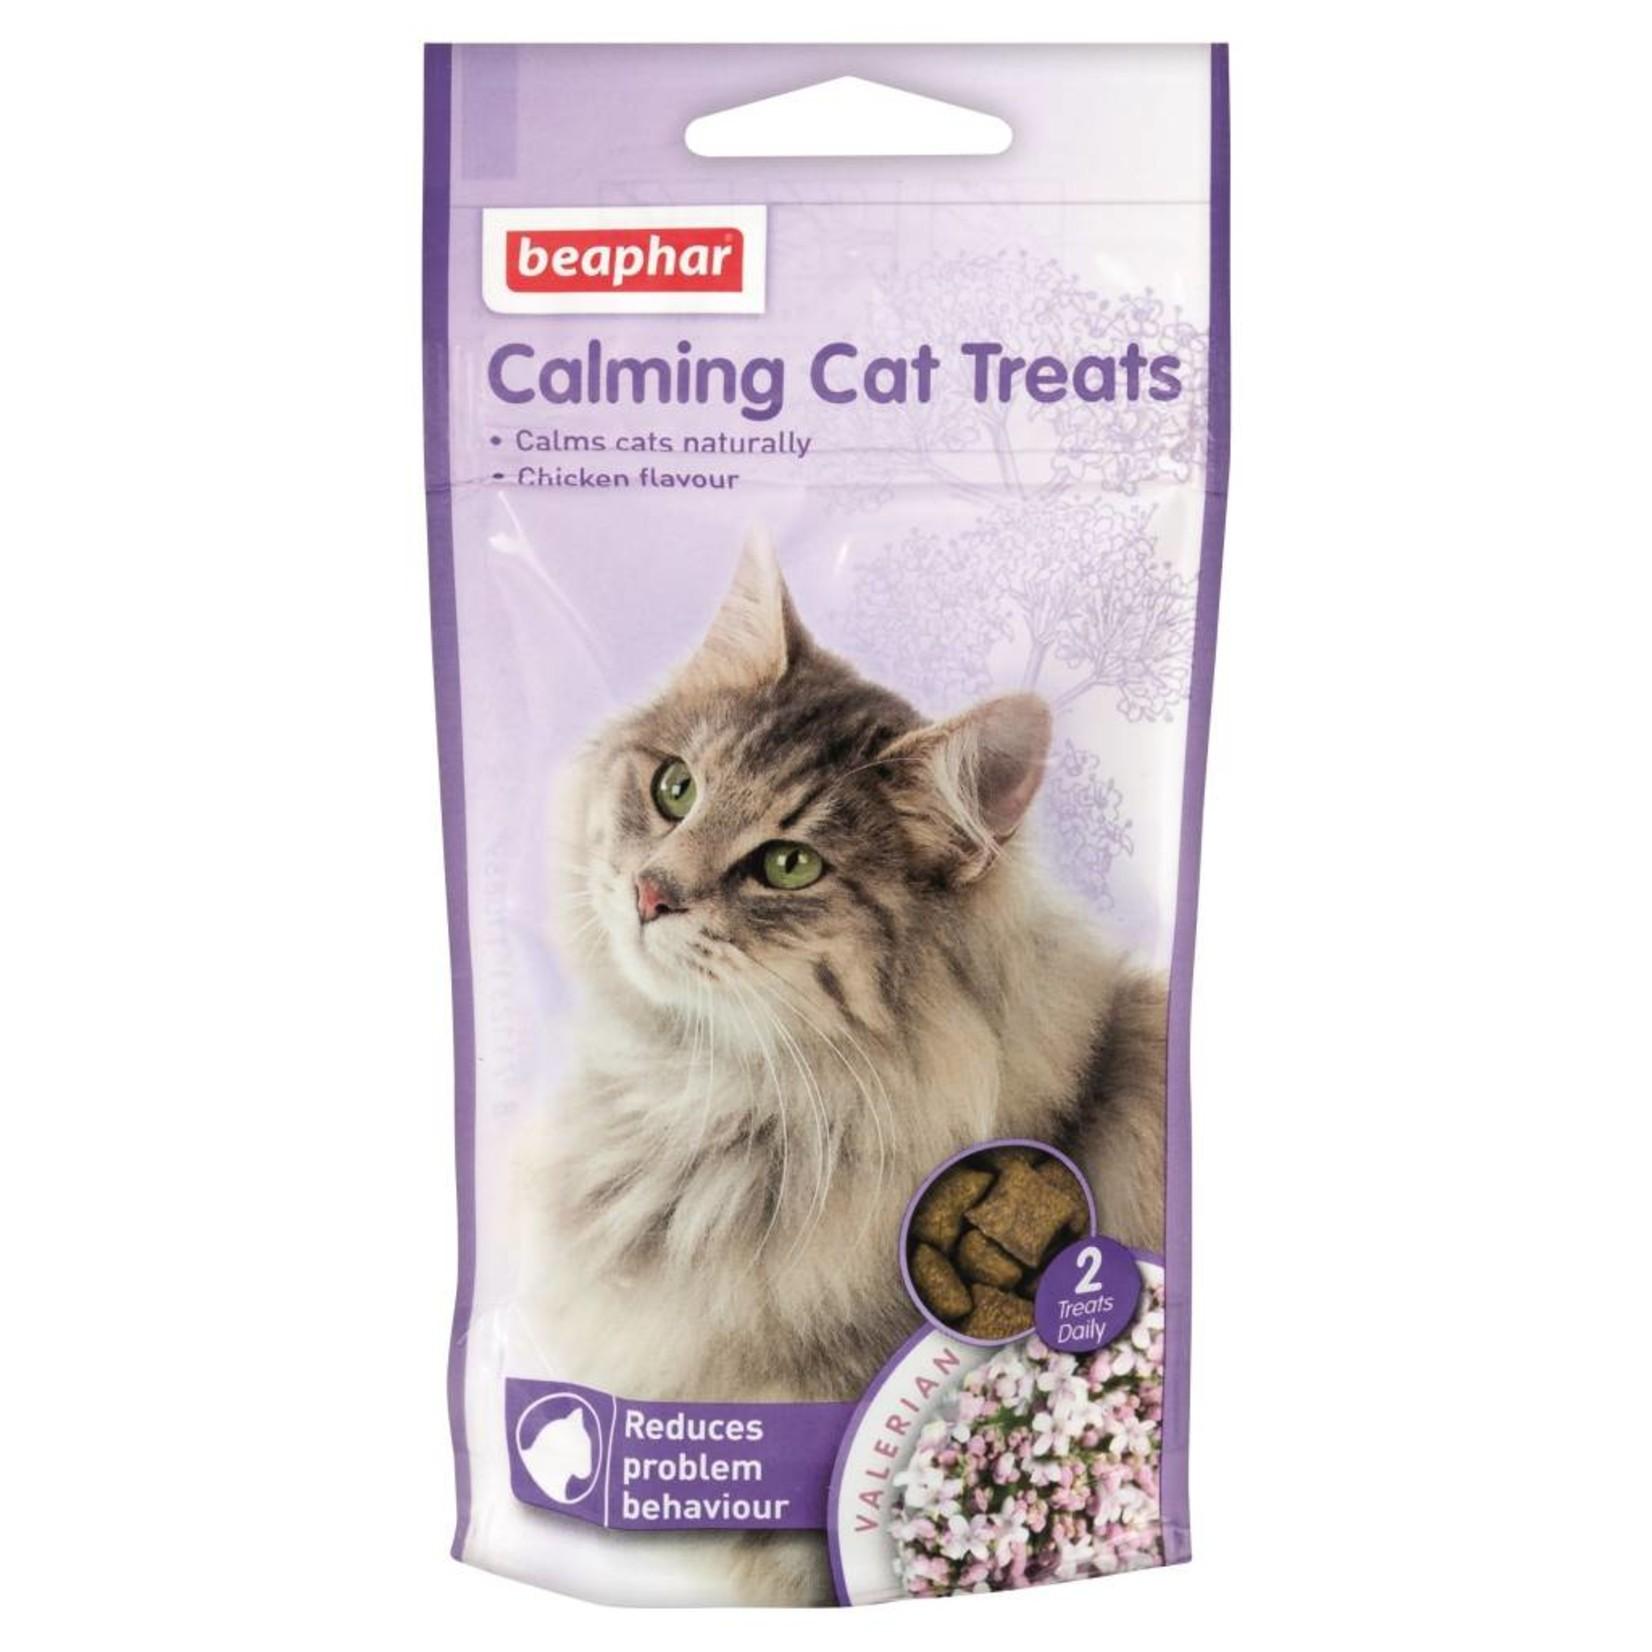 Beaphar Calming Treats for Cats, 35g